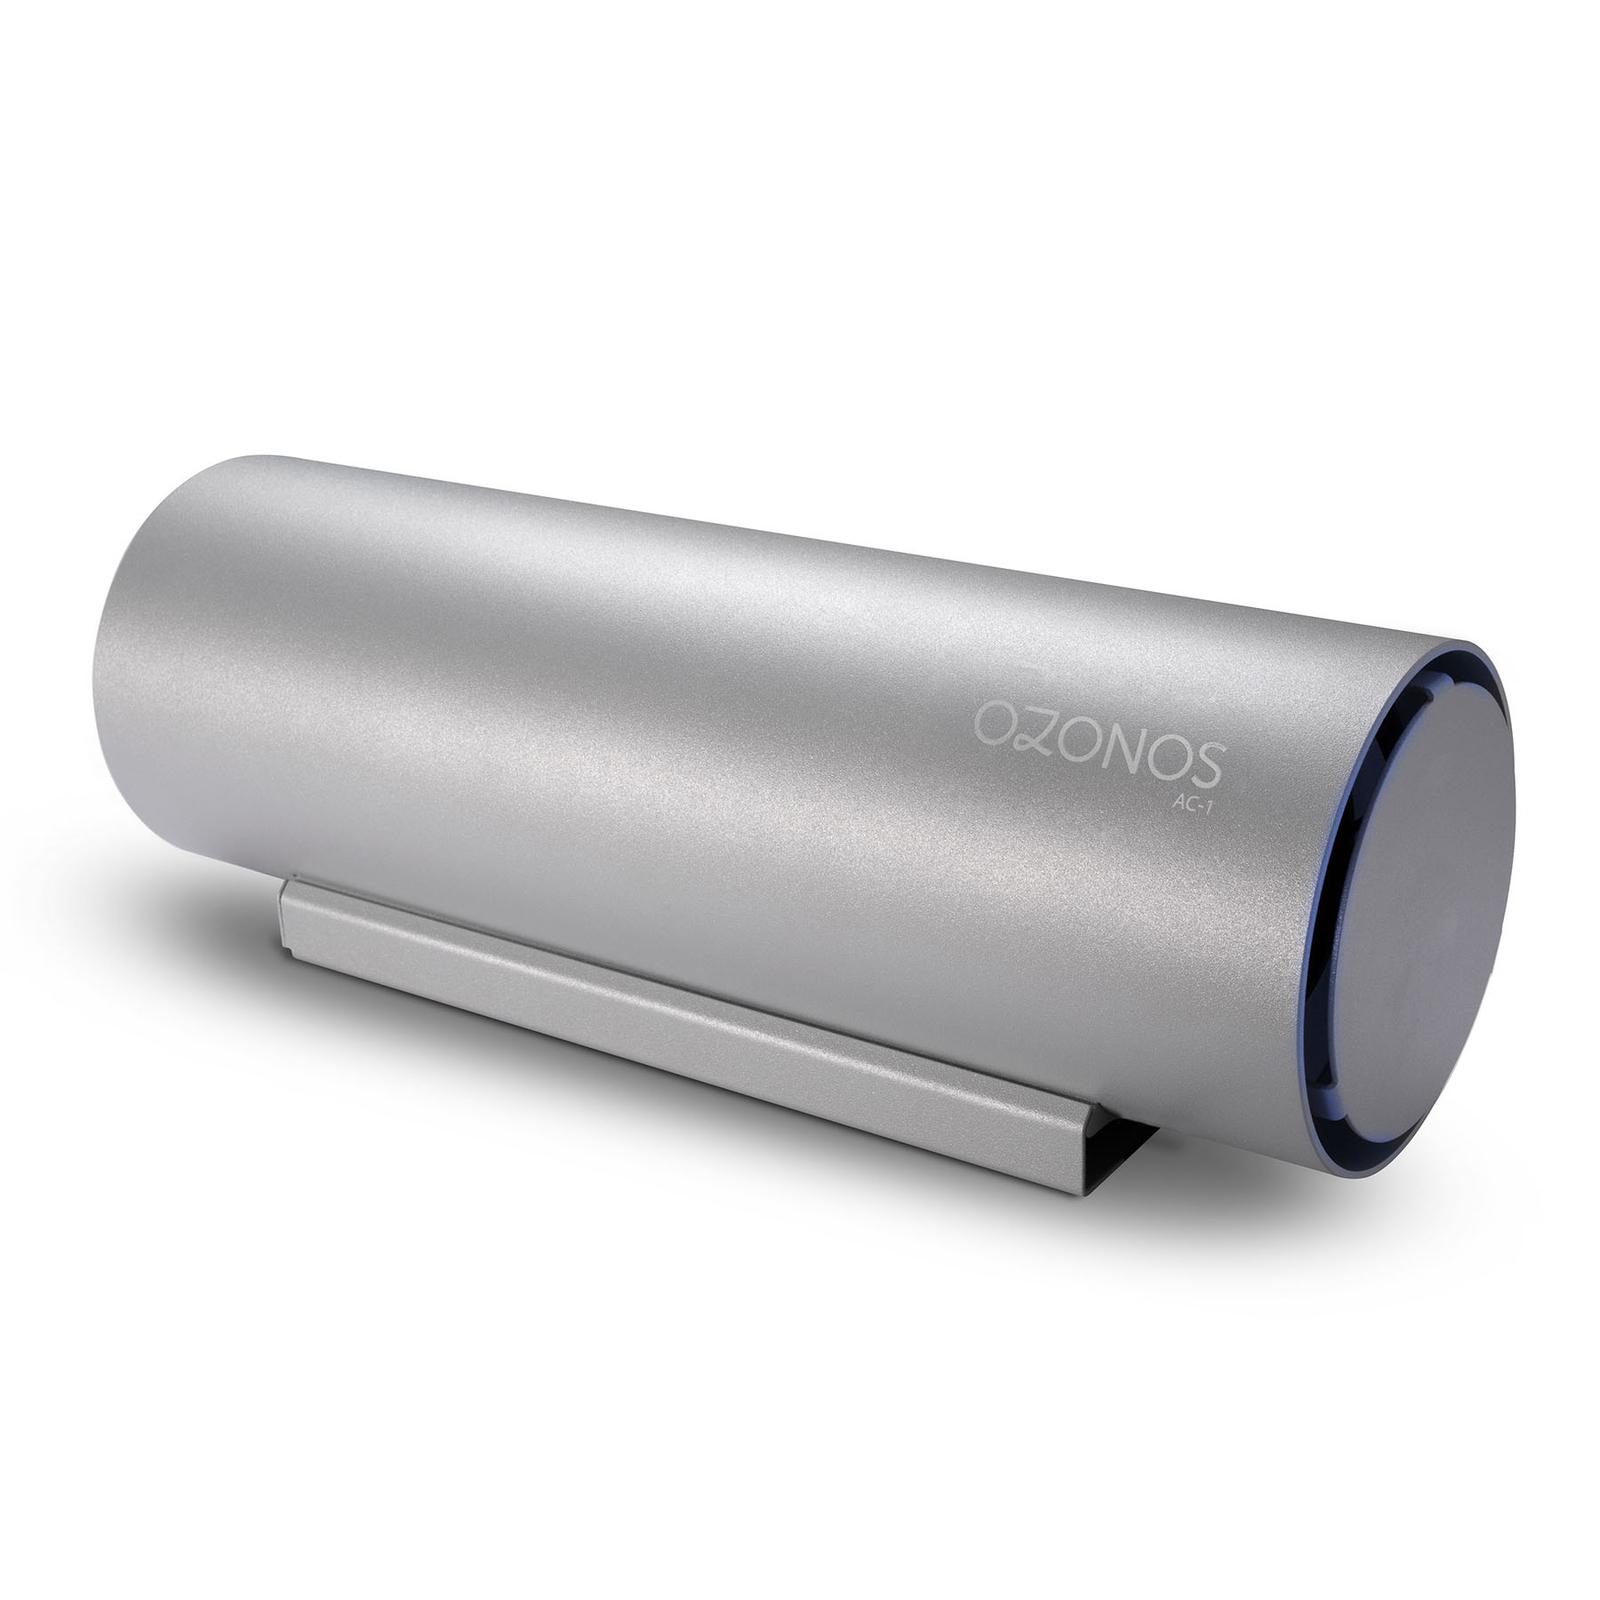 Ozonos AC-1 luftrenser, 0,048 ppm O3, sølv